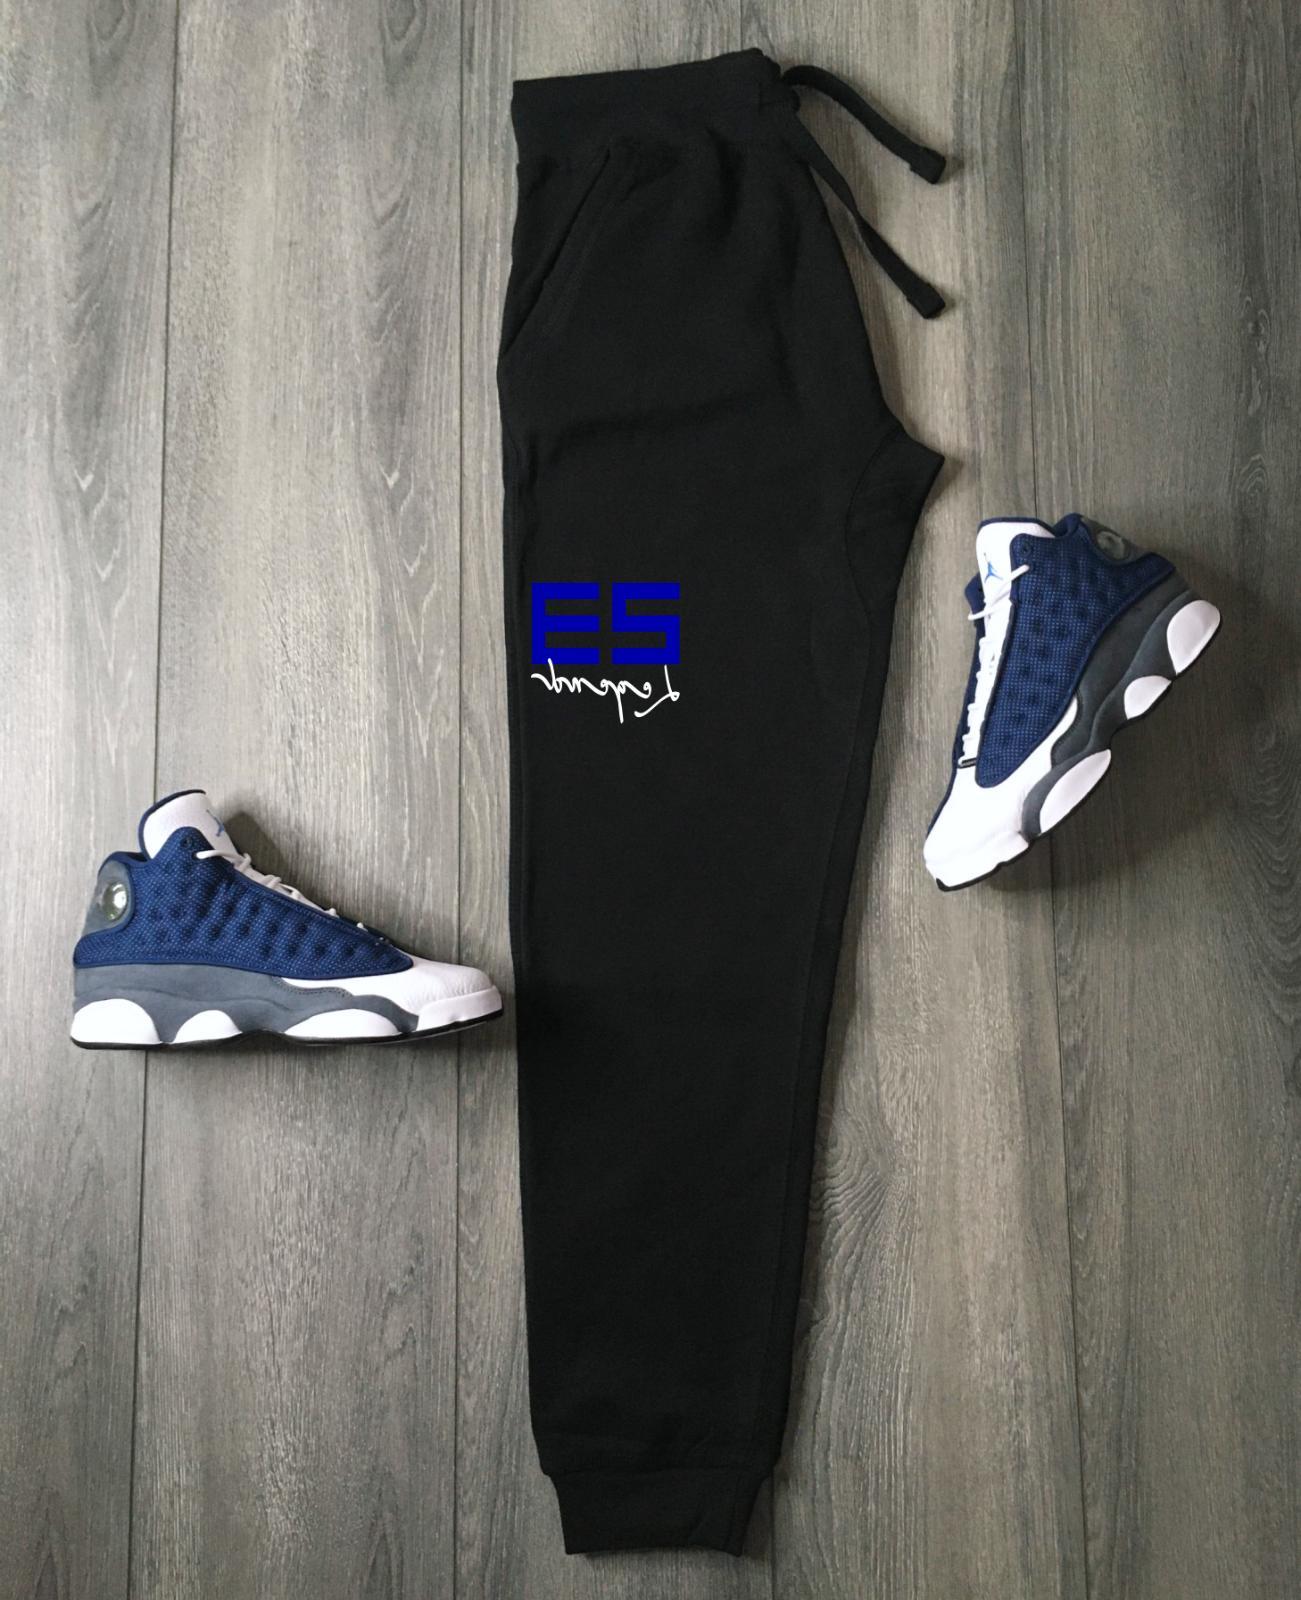 23 Black Blue Joggers To Match Jordan 13 Flint